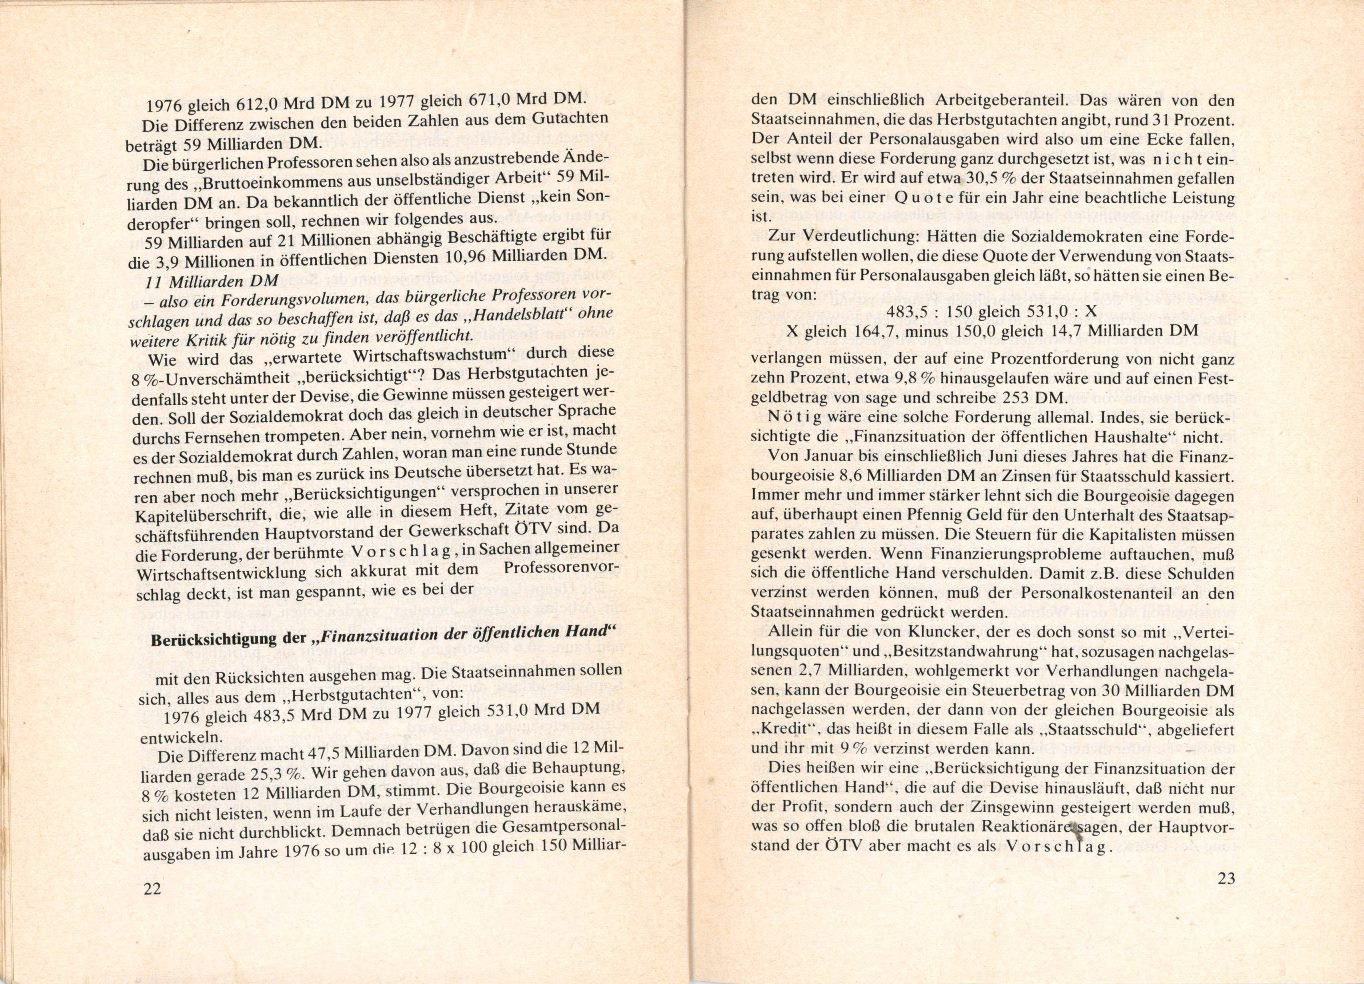 OTV_KBW_Klassenversoehnung_1976_12